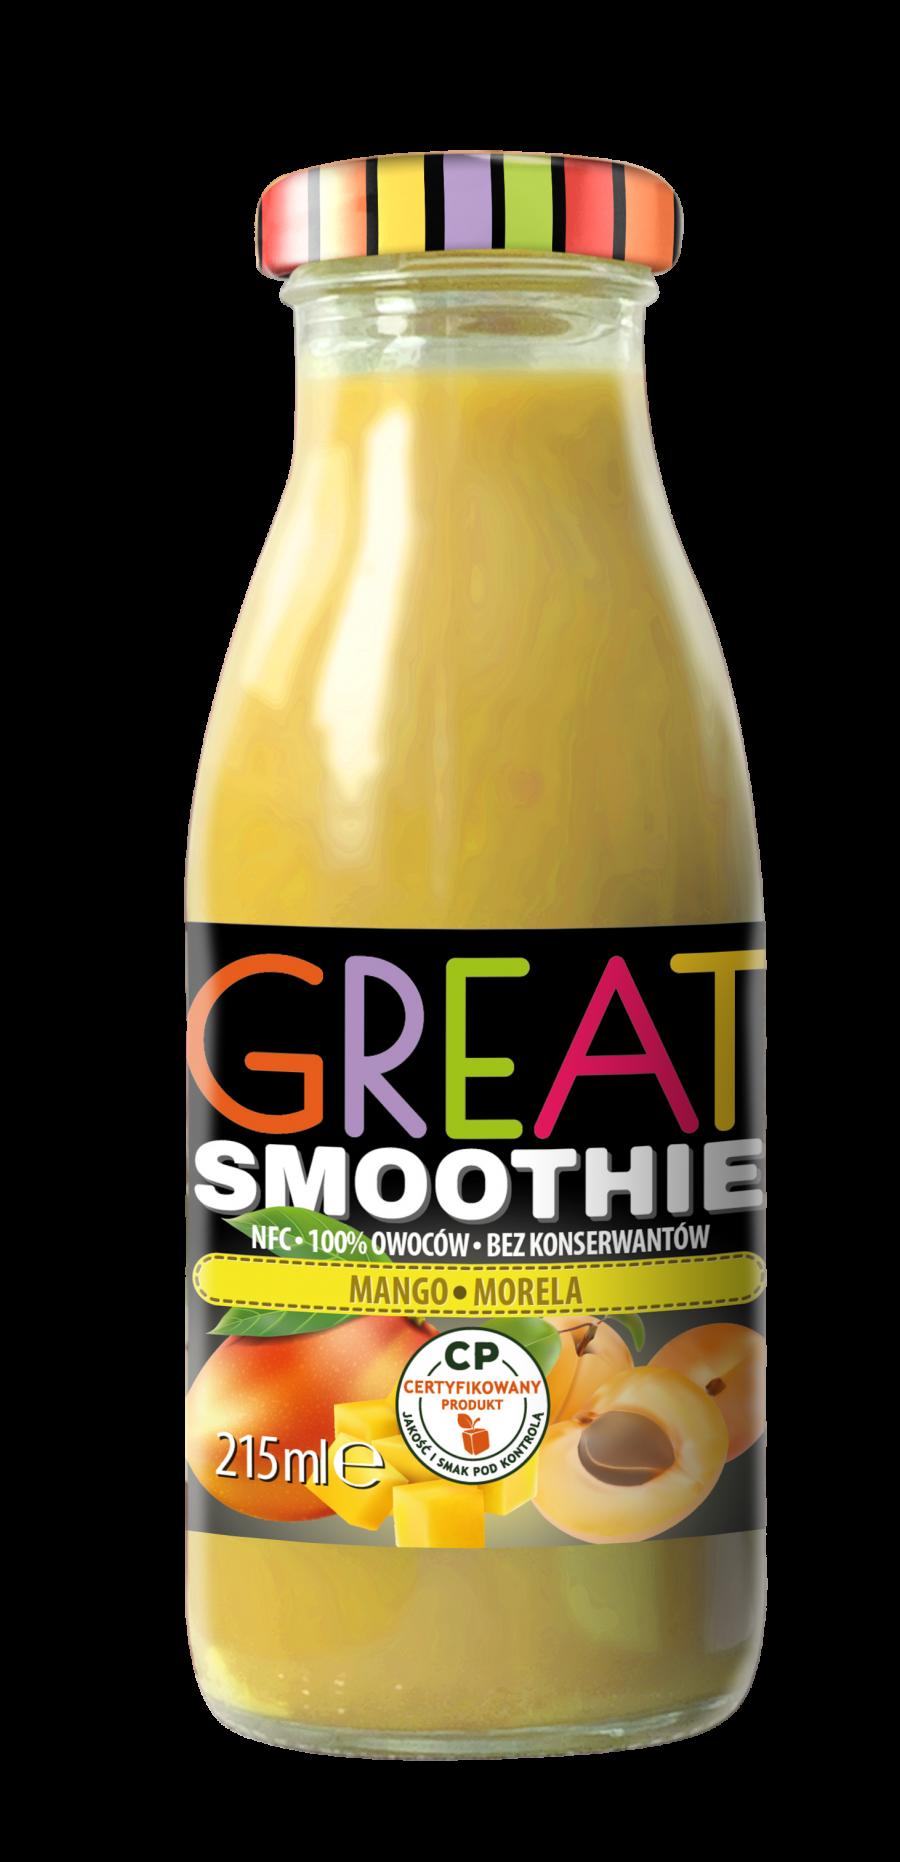 GREAT smoothie mango morela